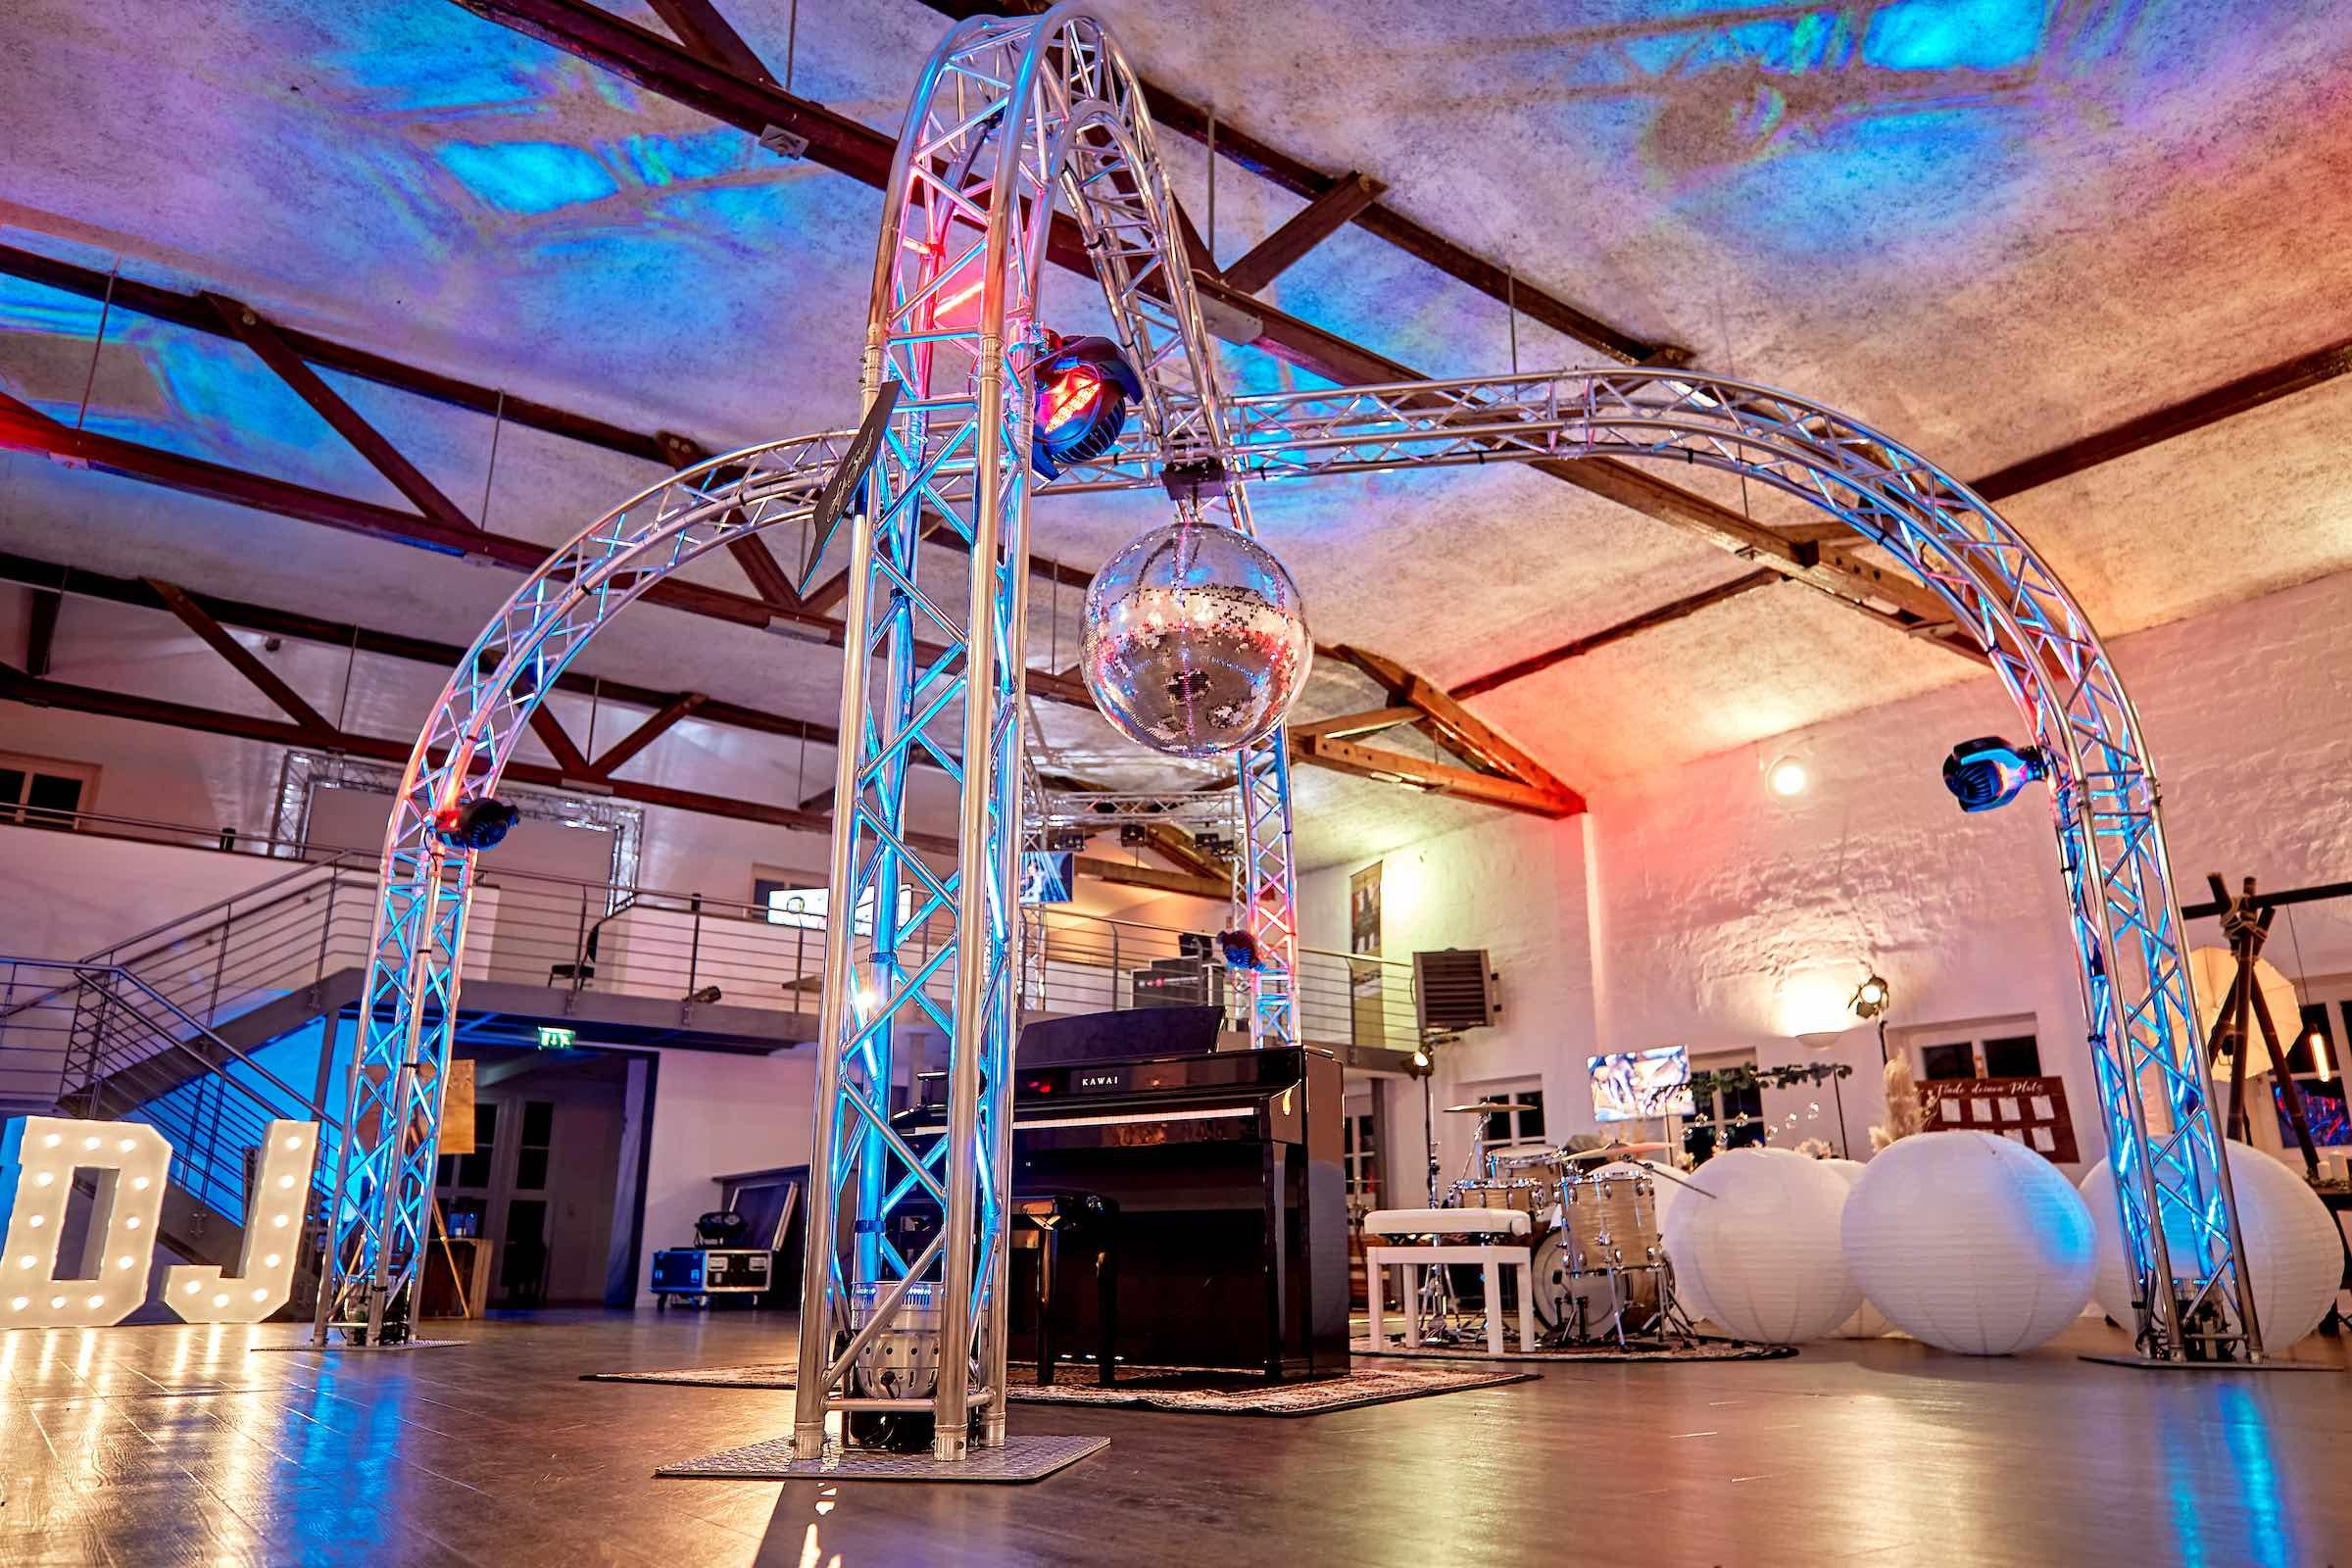 Lichttechnik | Veranstaltungstechnik | Beleuchtung | Tanzfläche | Lichtshow | Traversen | Traversentechnik | Beleuchtung | LED | Event | Messe | Firmenfeier | Buchen | Mieten | Hannover